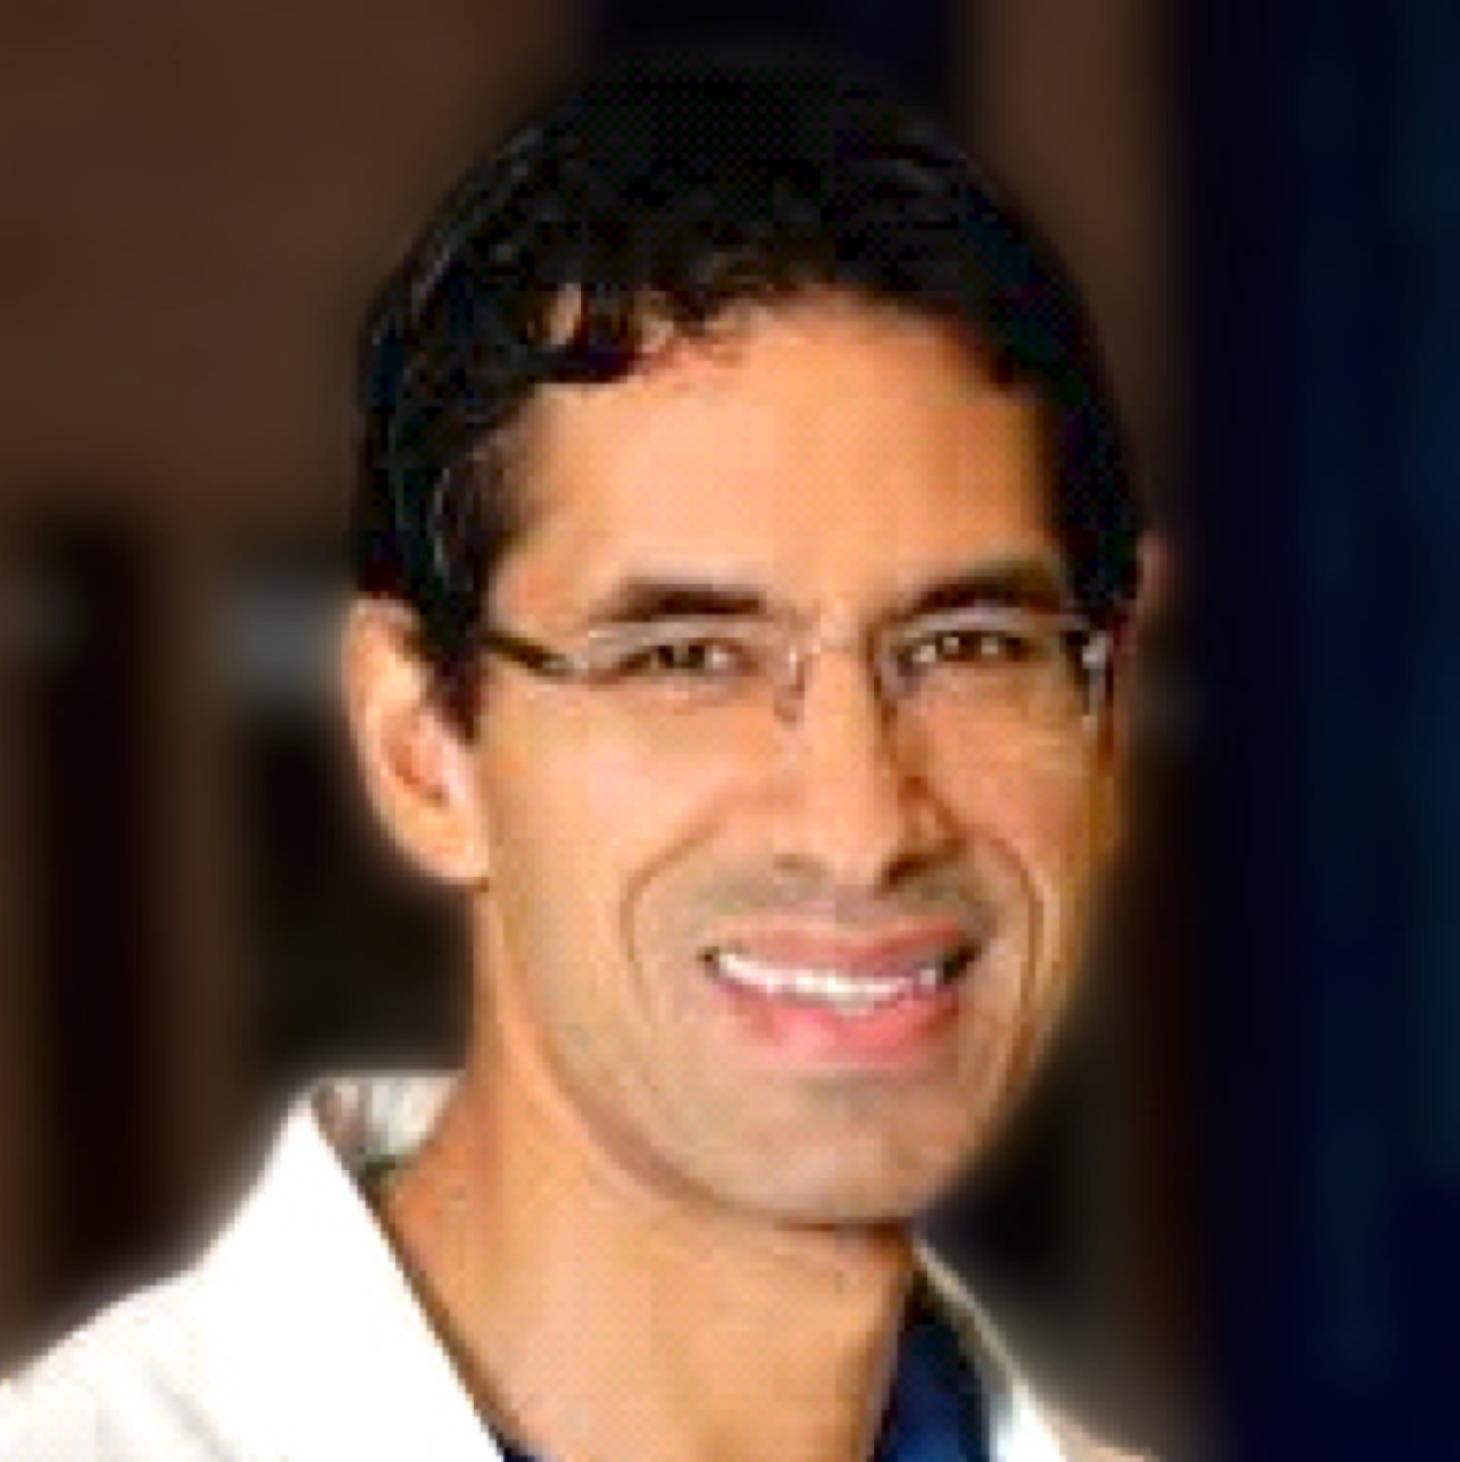 Prof.Taufik A.Valiante, M.D., Ph.D.   U. Toronto, Toronto Western Hospital, Krembil Research Institute